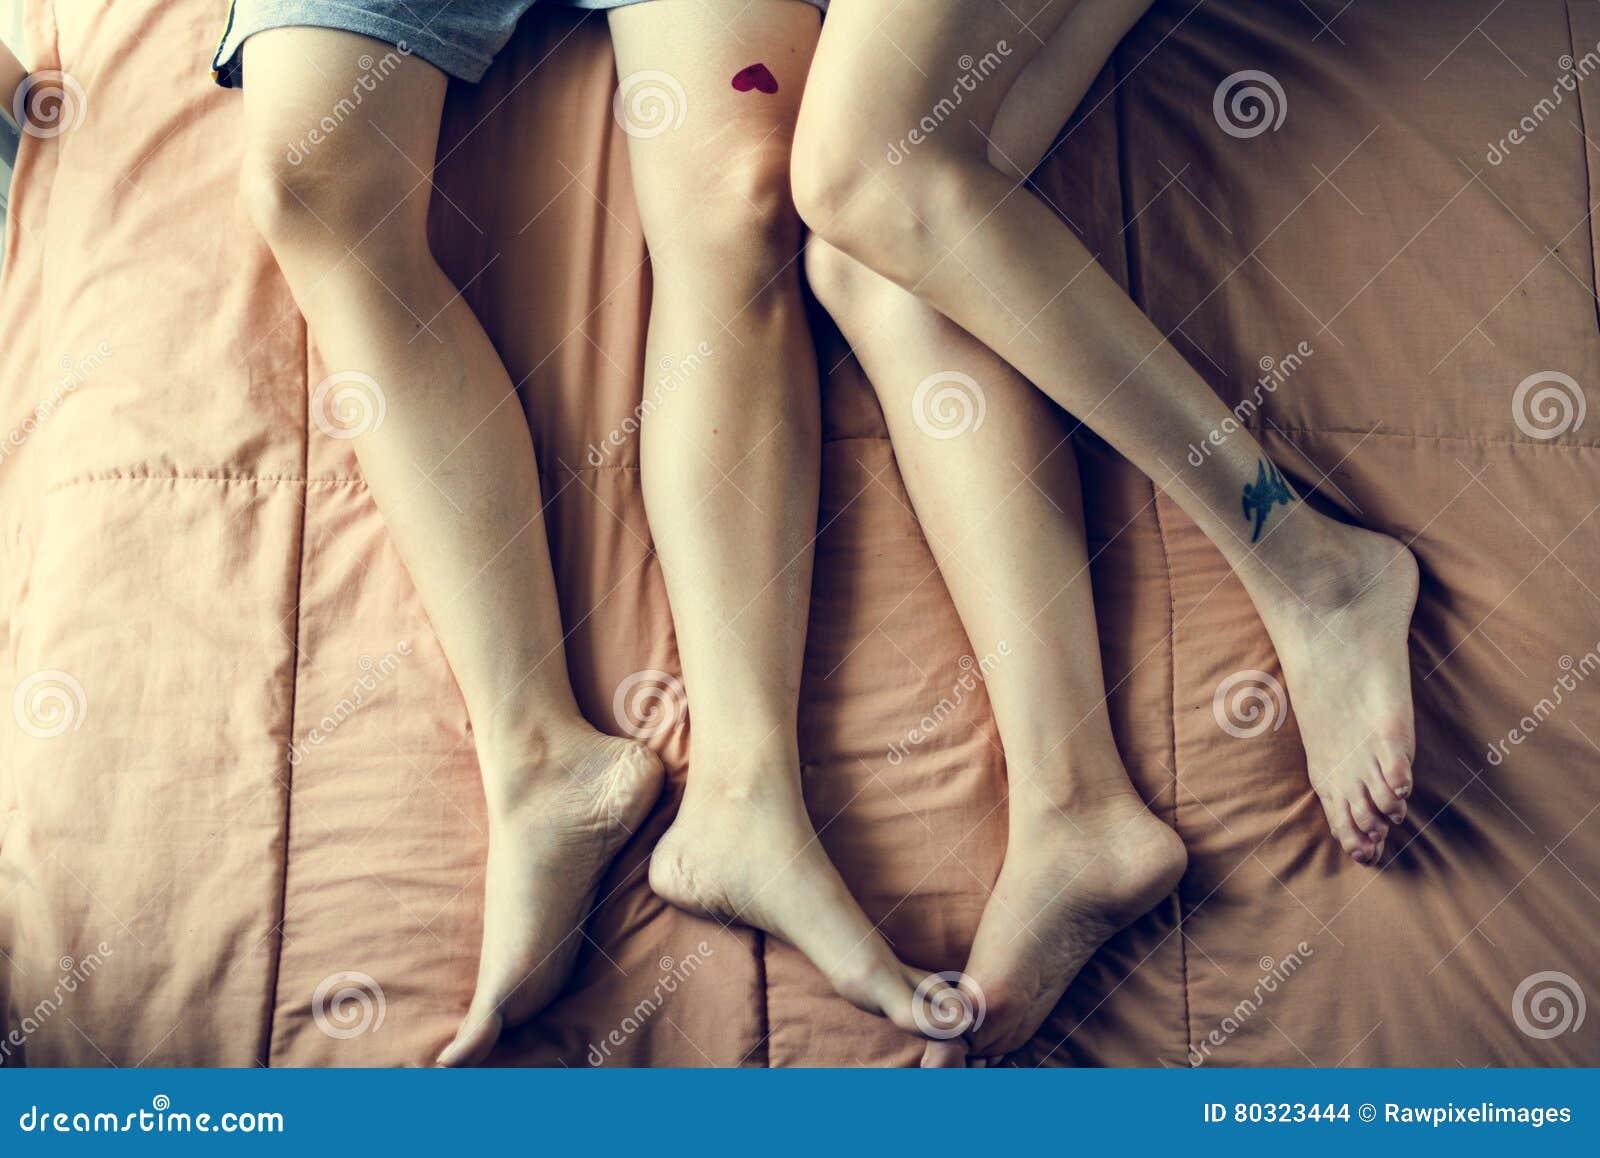 Foot leg lesbian